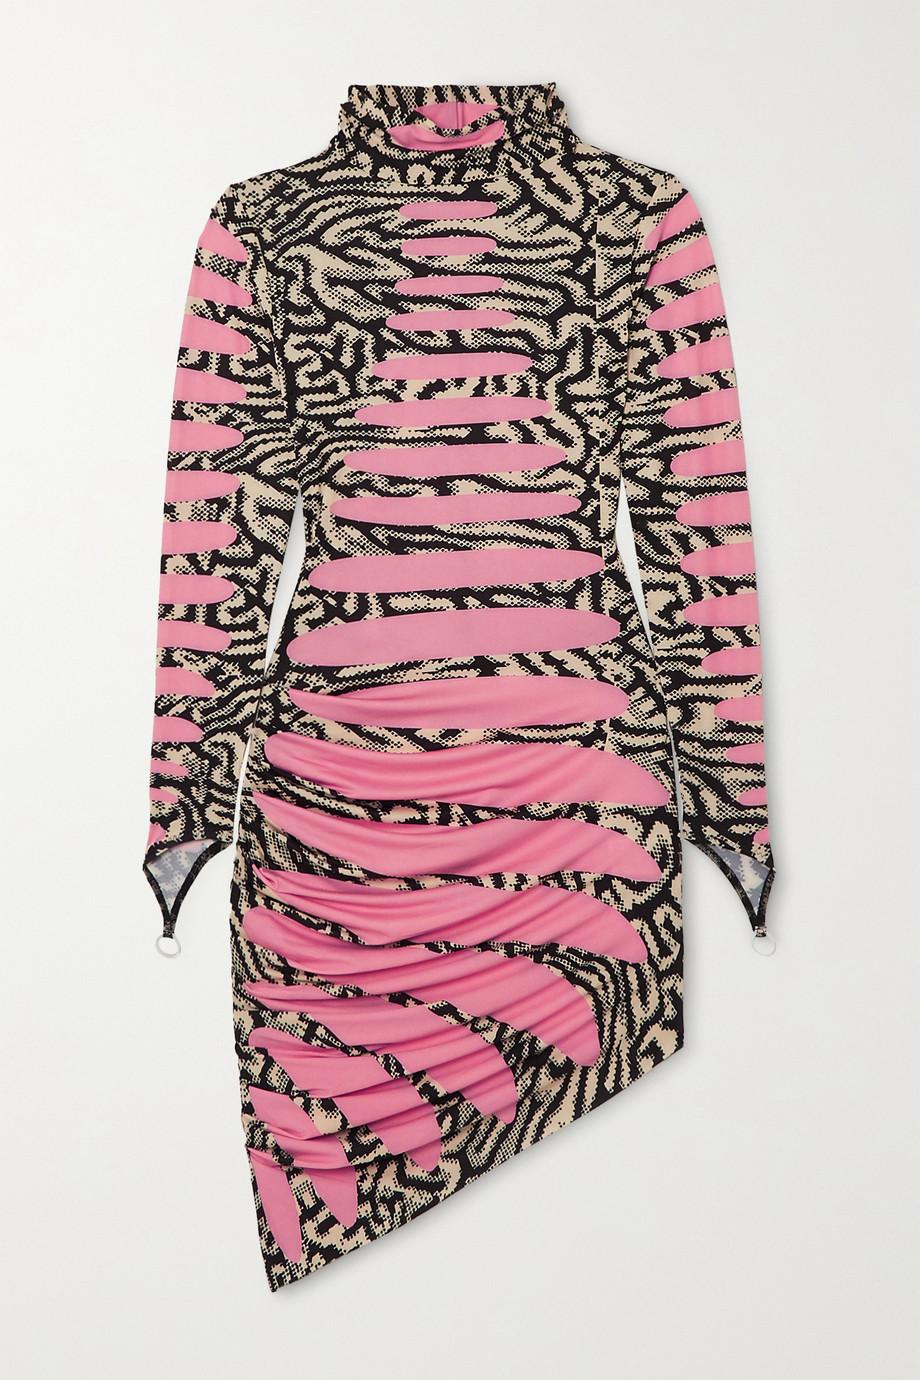 Maisie Wilen Ruched printed stretch-jersey turtleneck mini dress